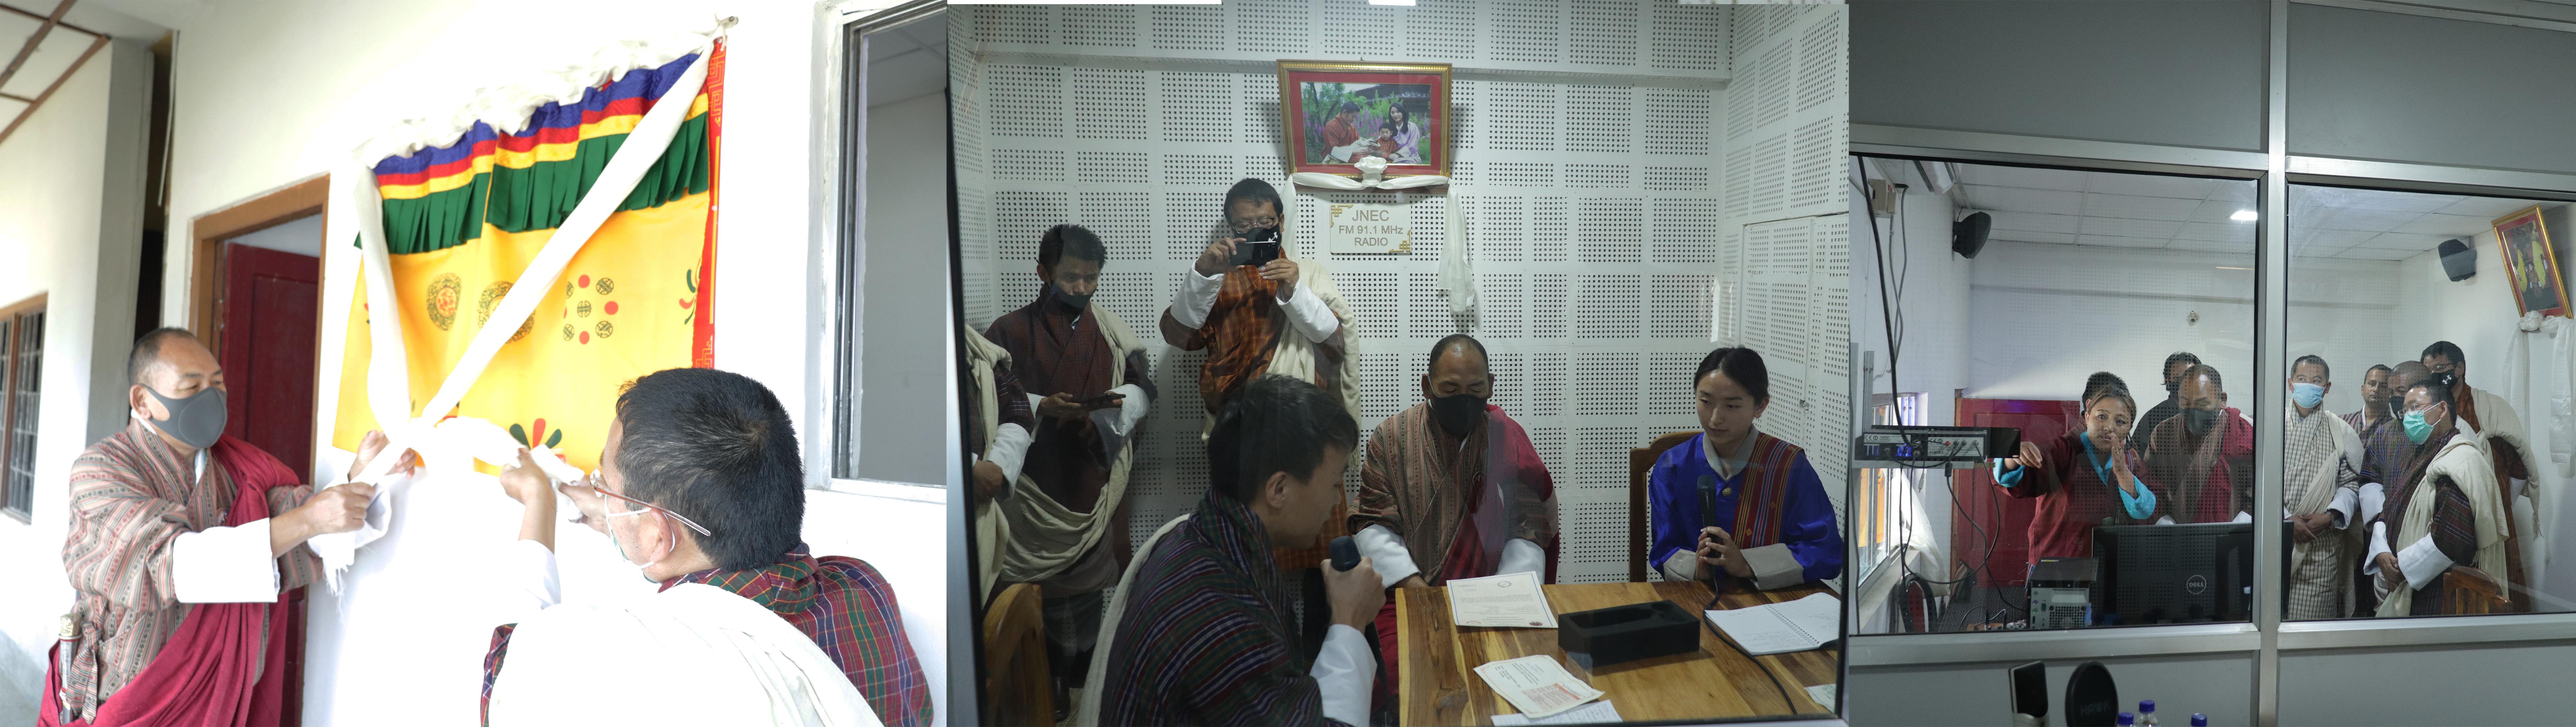 Hon'ble Dasho Dzongda Inaugurates the JNEC Campus Radio